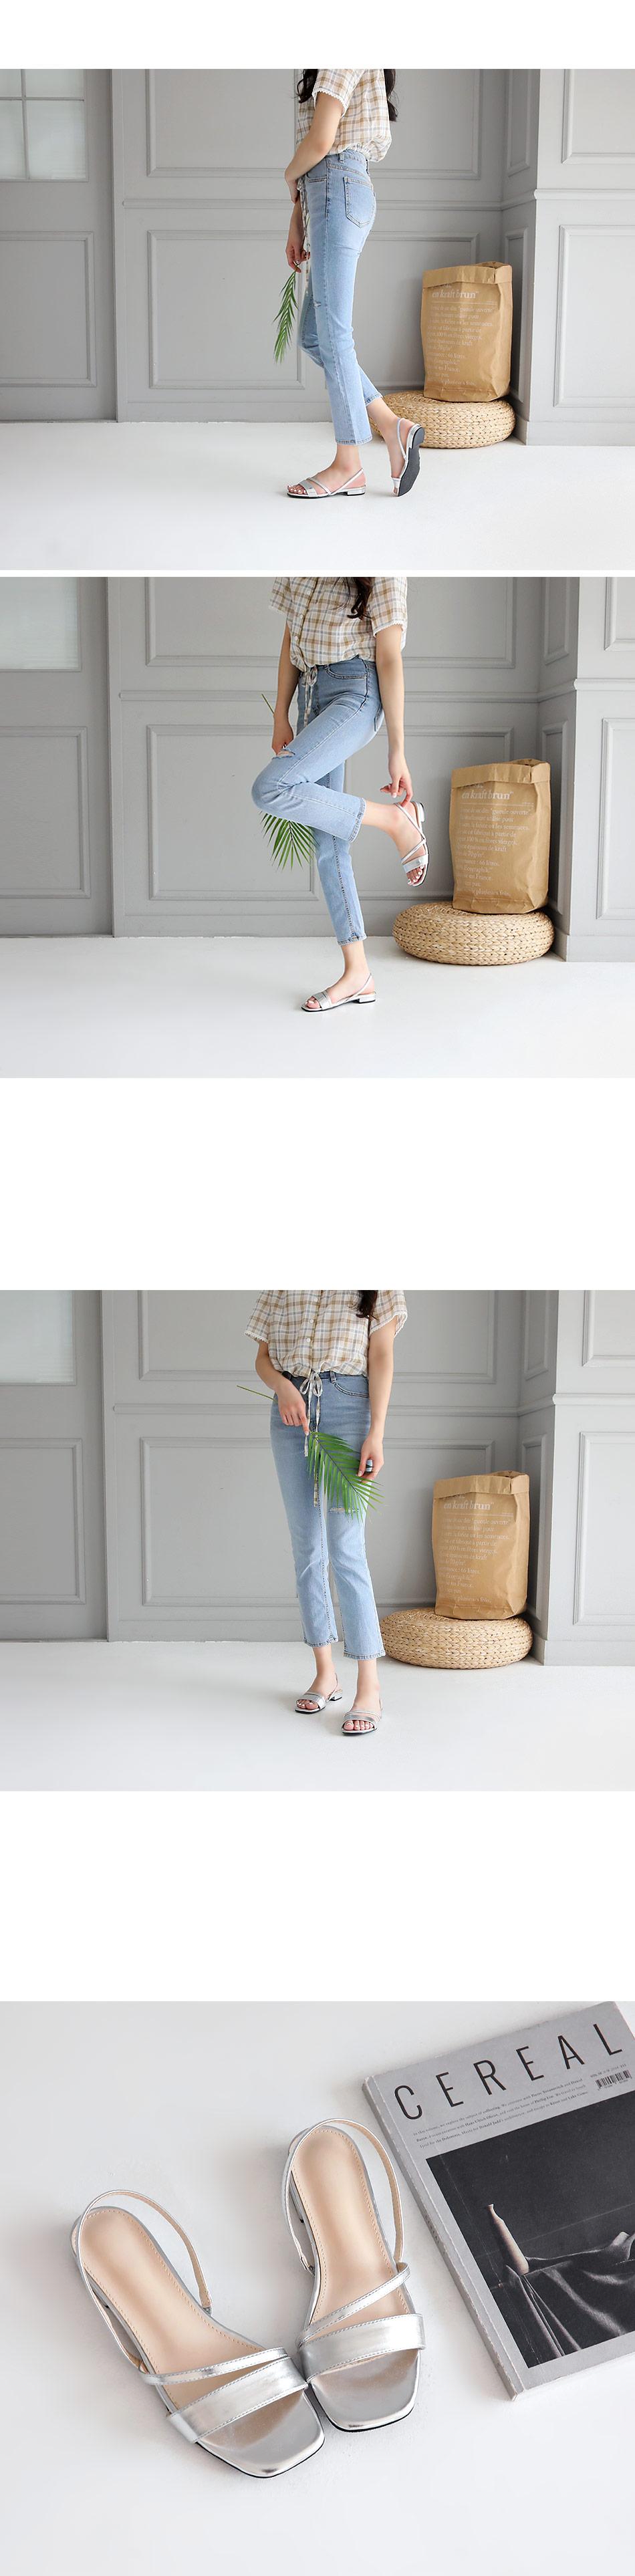 Rubian Slingback Sandals 2cm